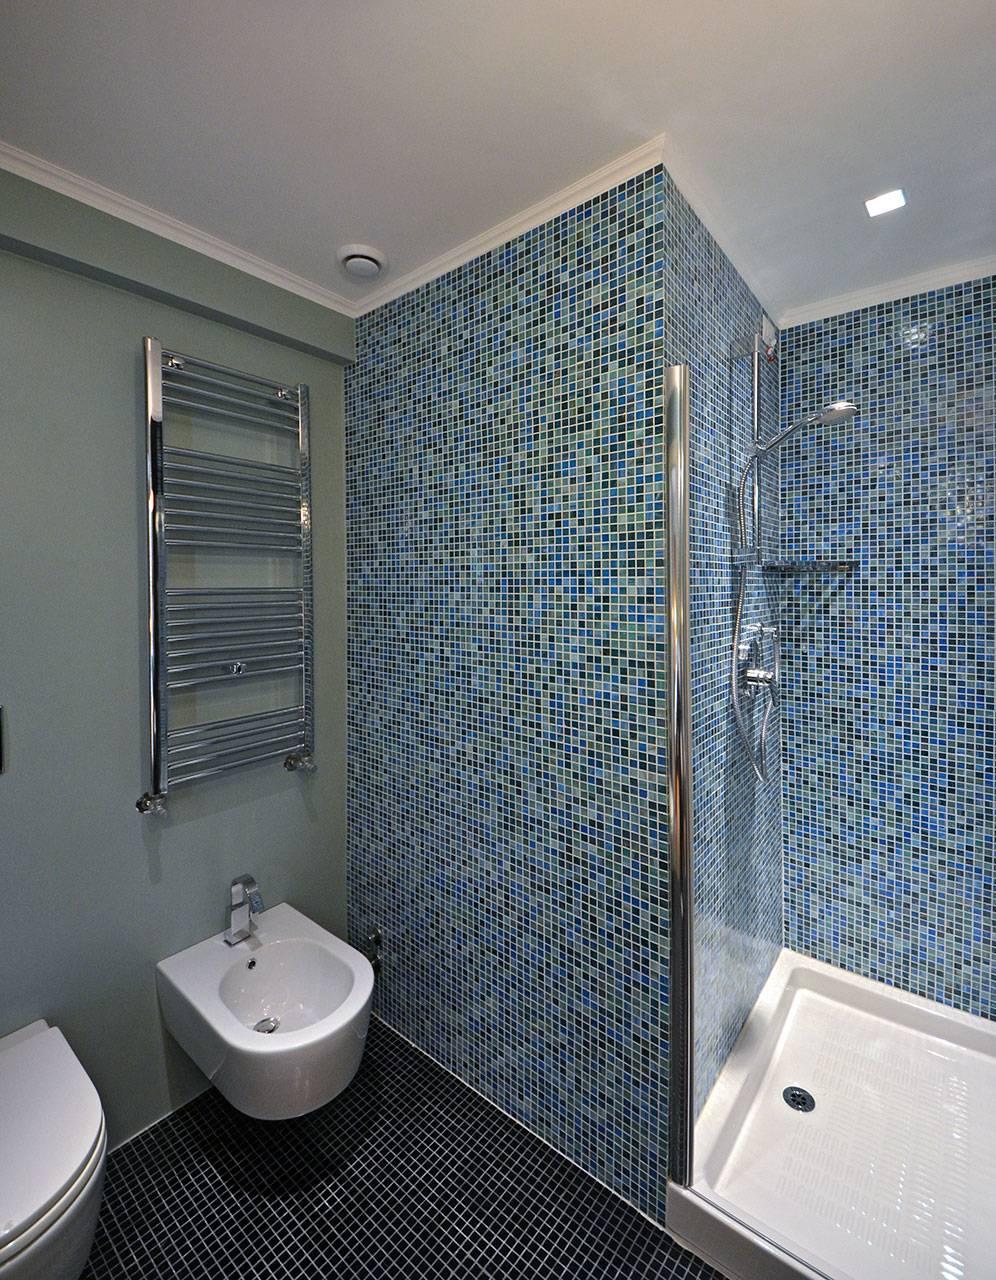 bathroom of the 4th bedroom